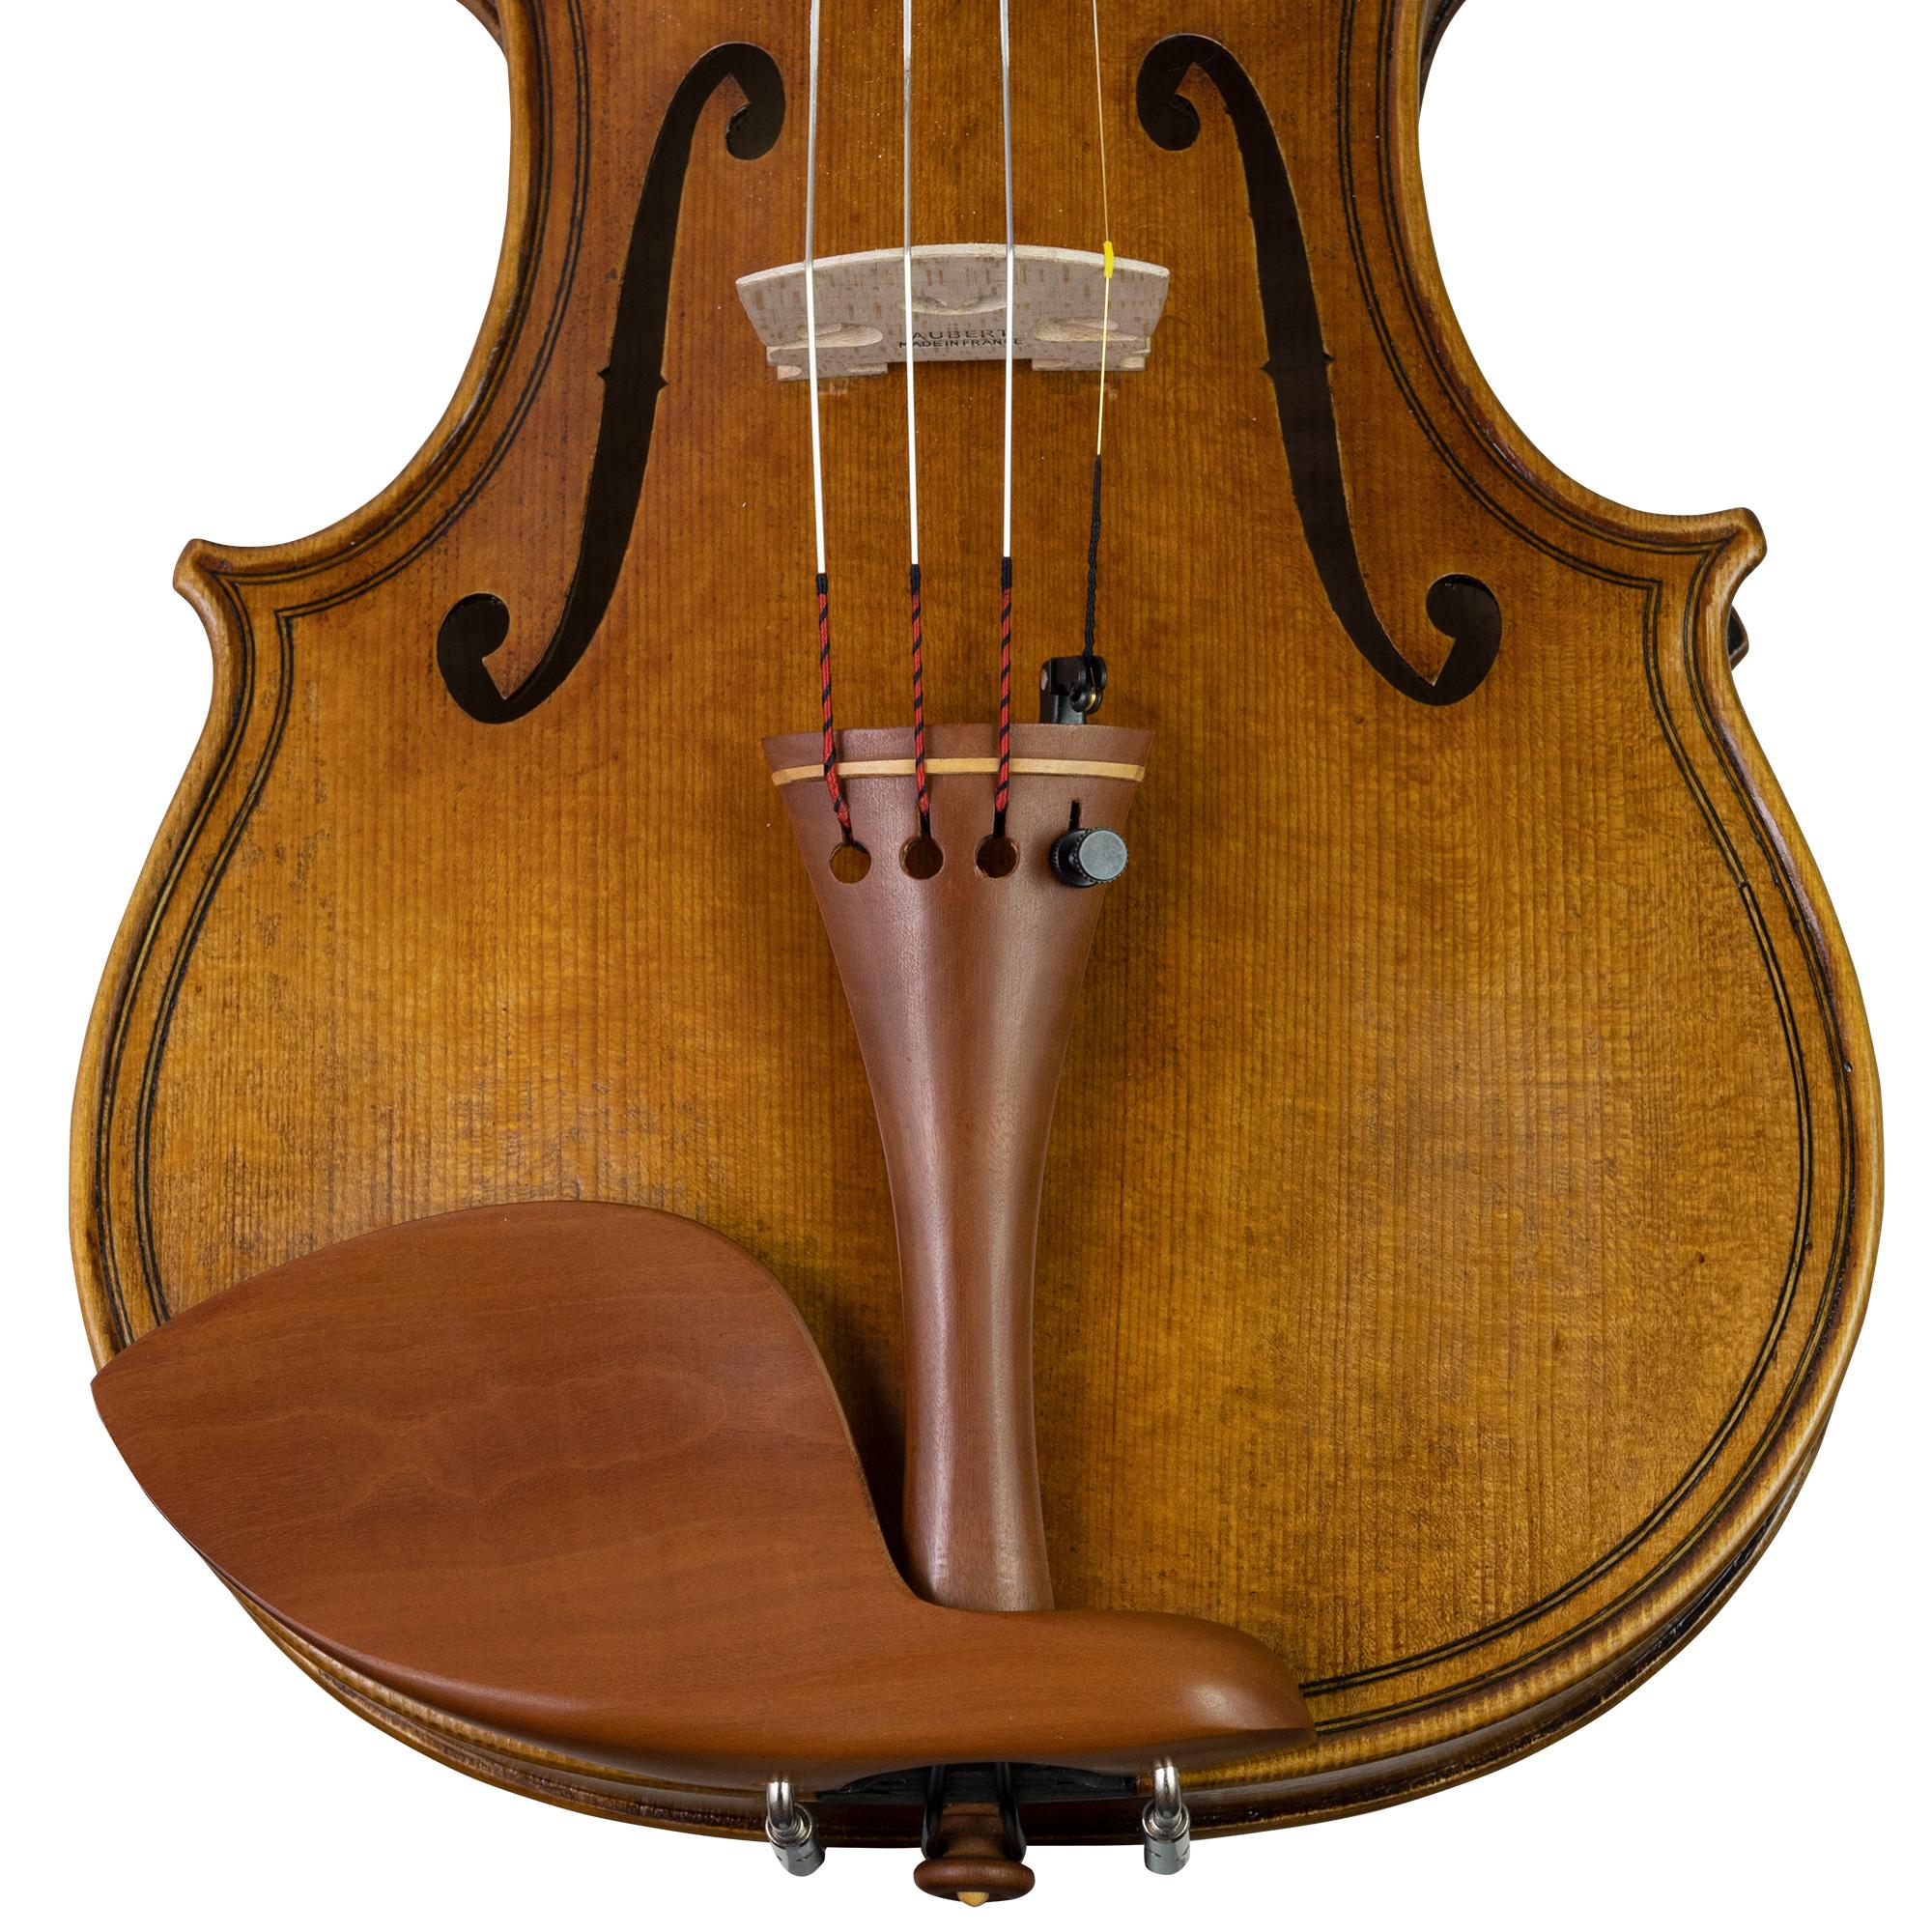 David Yale Maestro